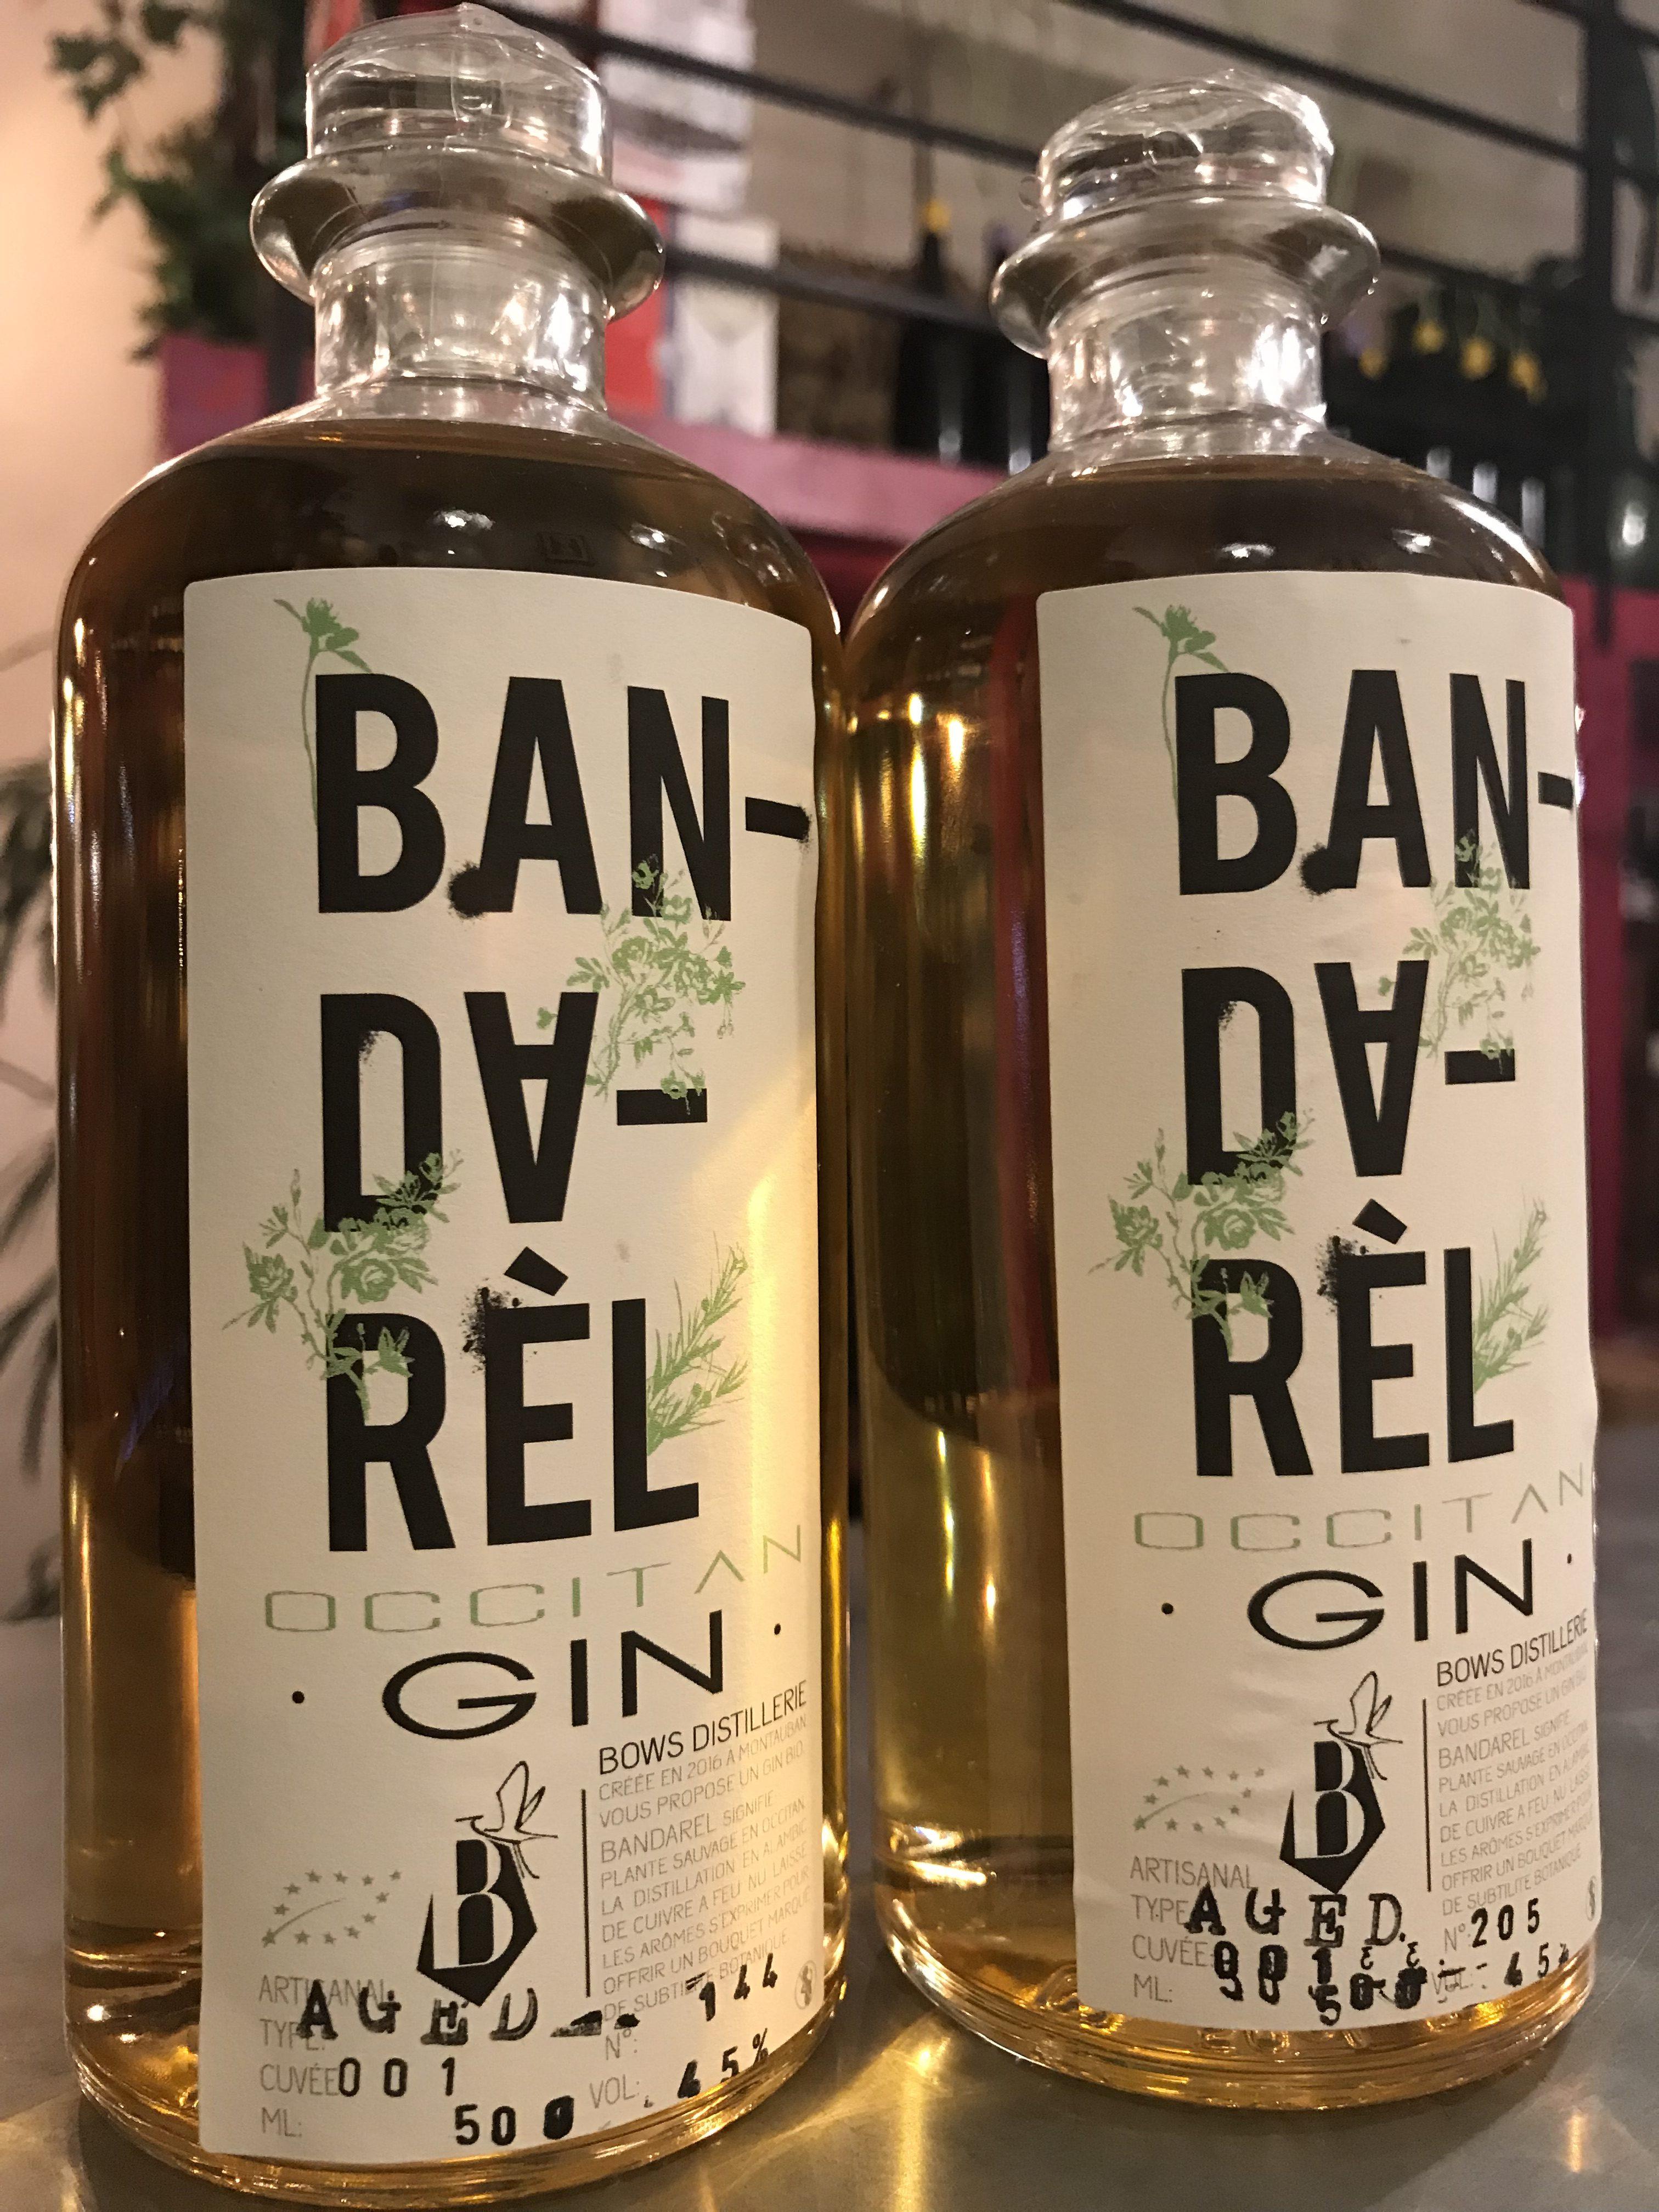 BOW'S BANDAREL GIN